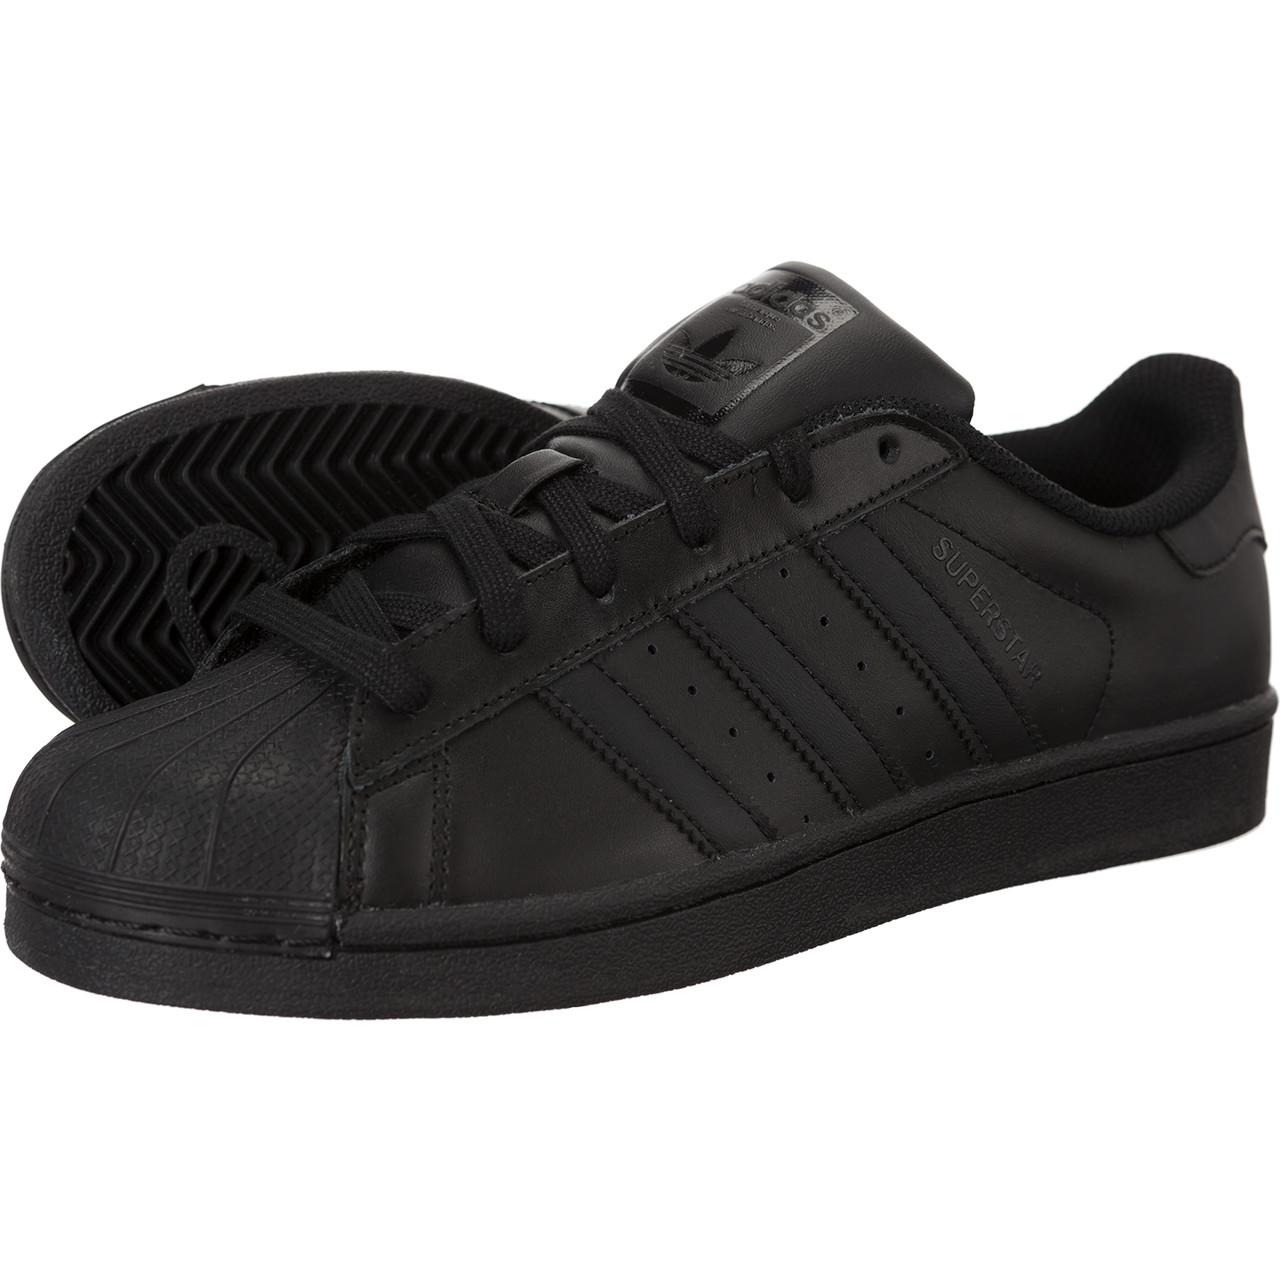 ... 0e86b8325094 buty adidas Superstar r 35 1 2 B25724 - 7326495626 -  oficjalne . f8c3141fa141c